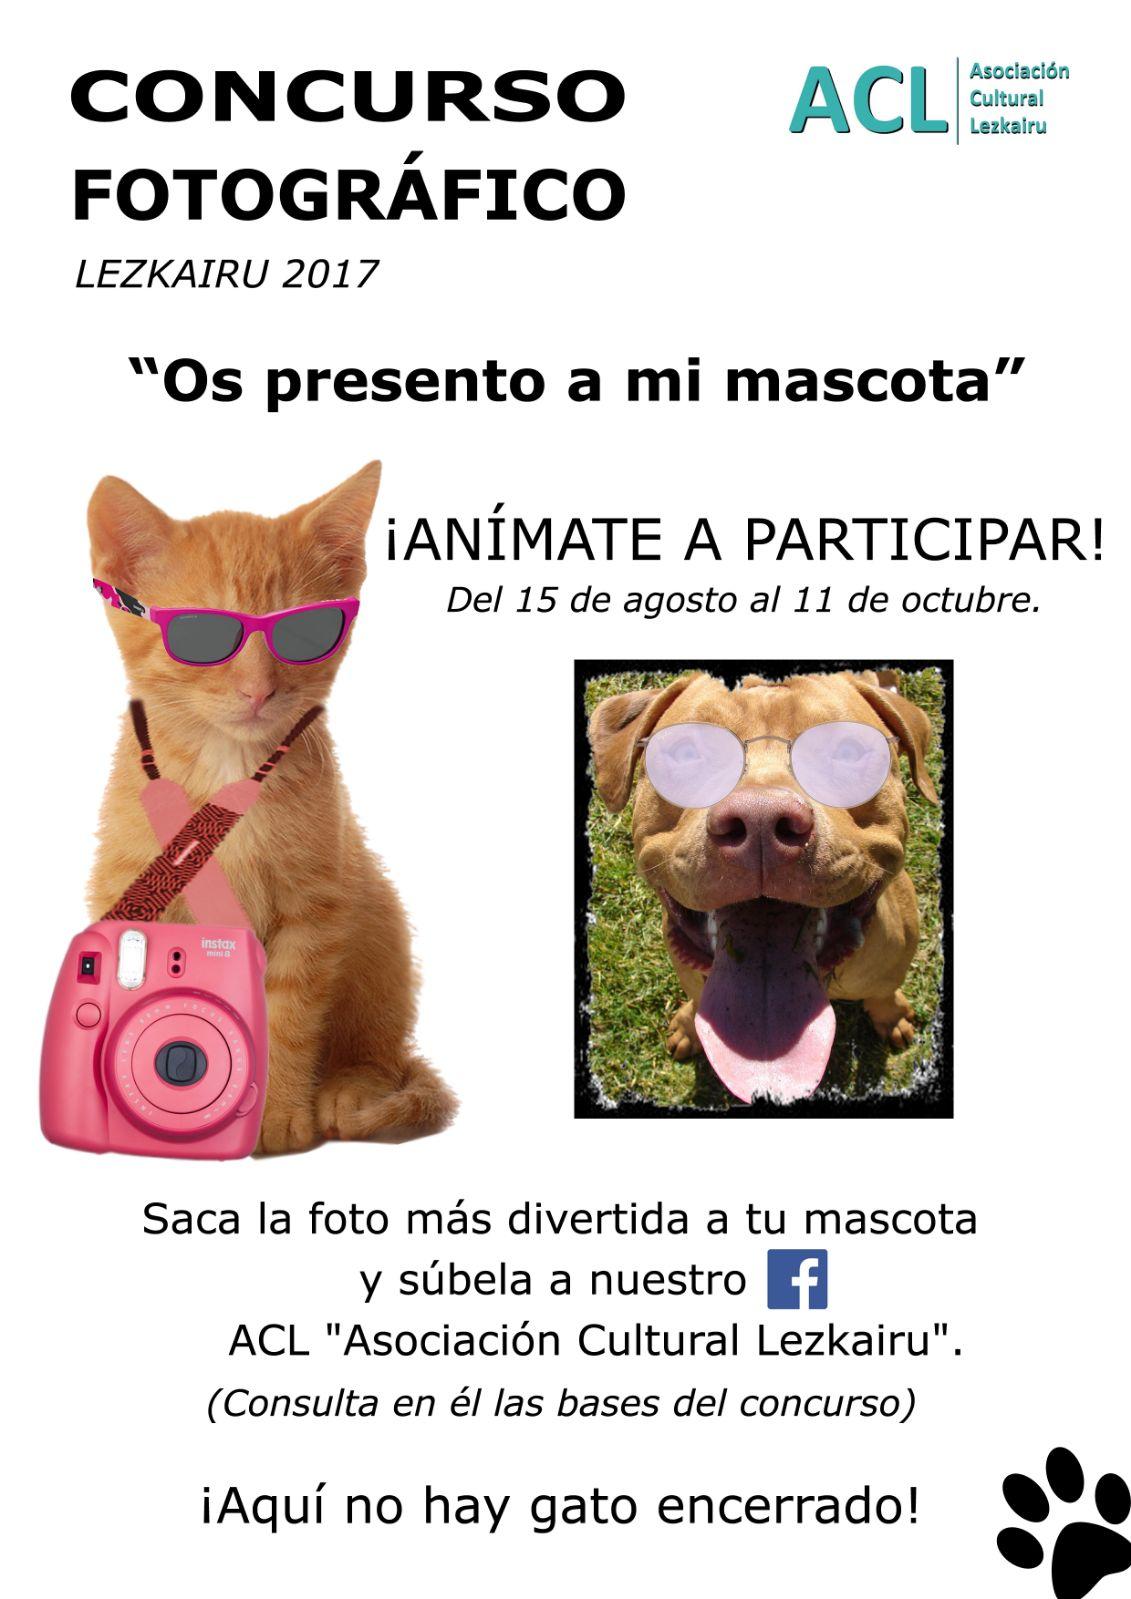 Concurso fotográfico 'Os presento a mi mascota'